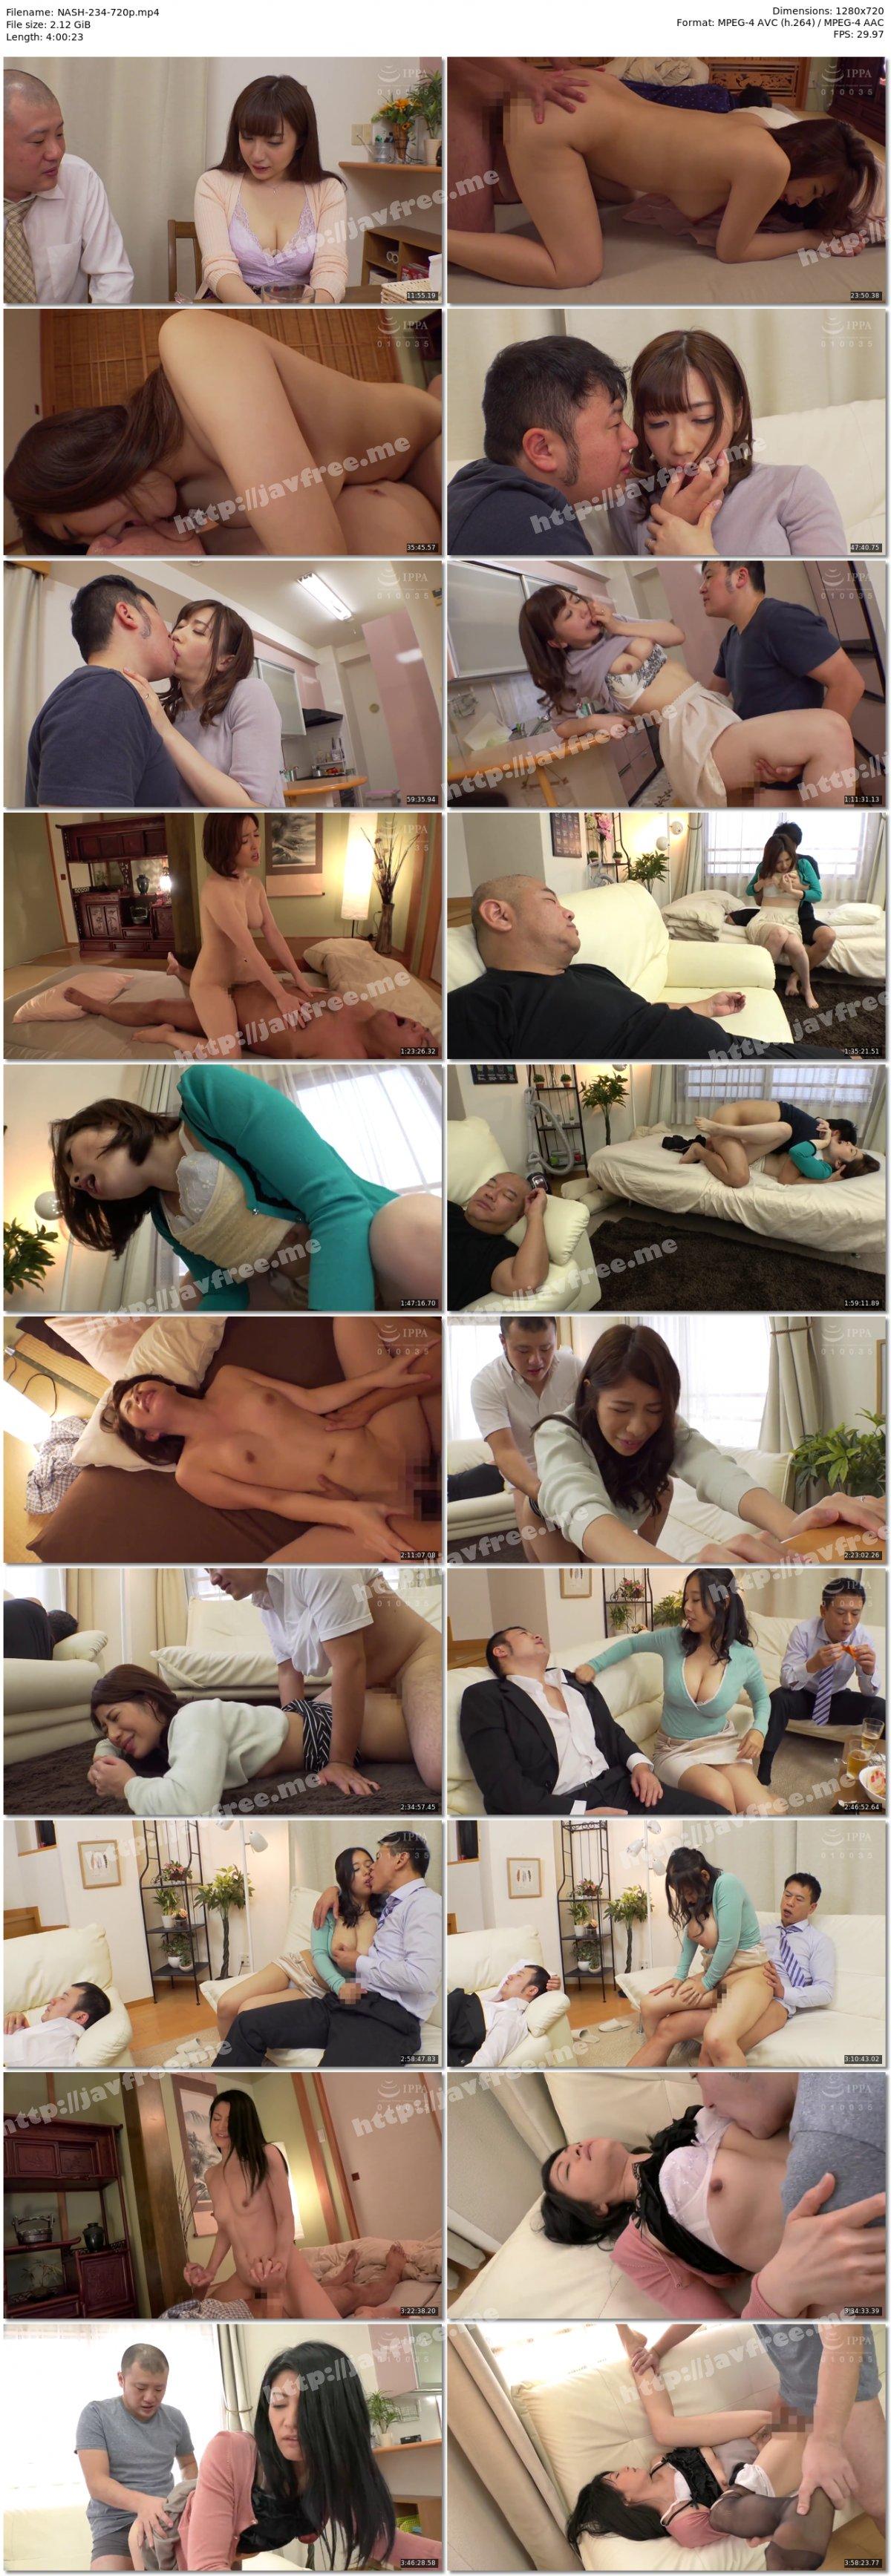 [HD][NASH-234] 旦那の隣で寝取られた人妻6人 - image NASH-234-720p on https://javfree.me